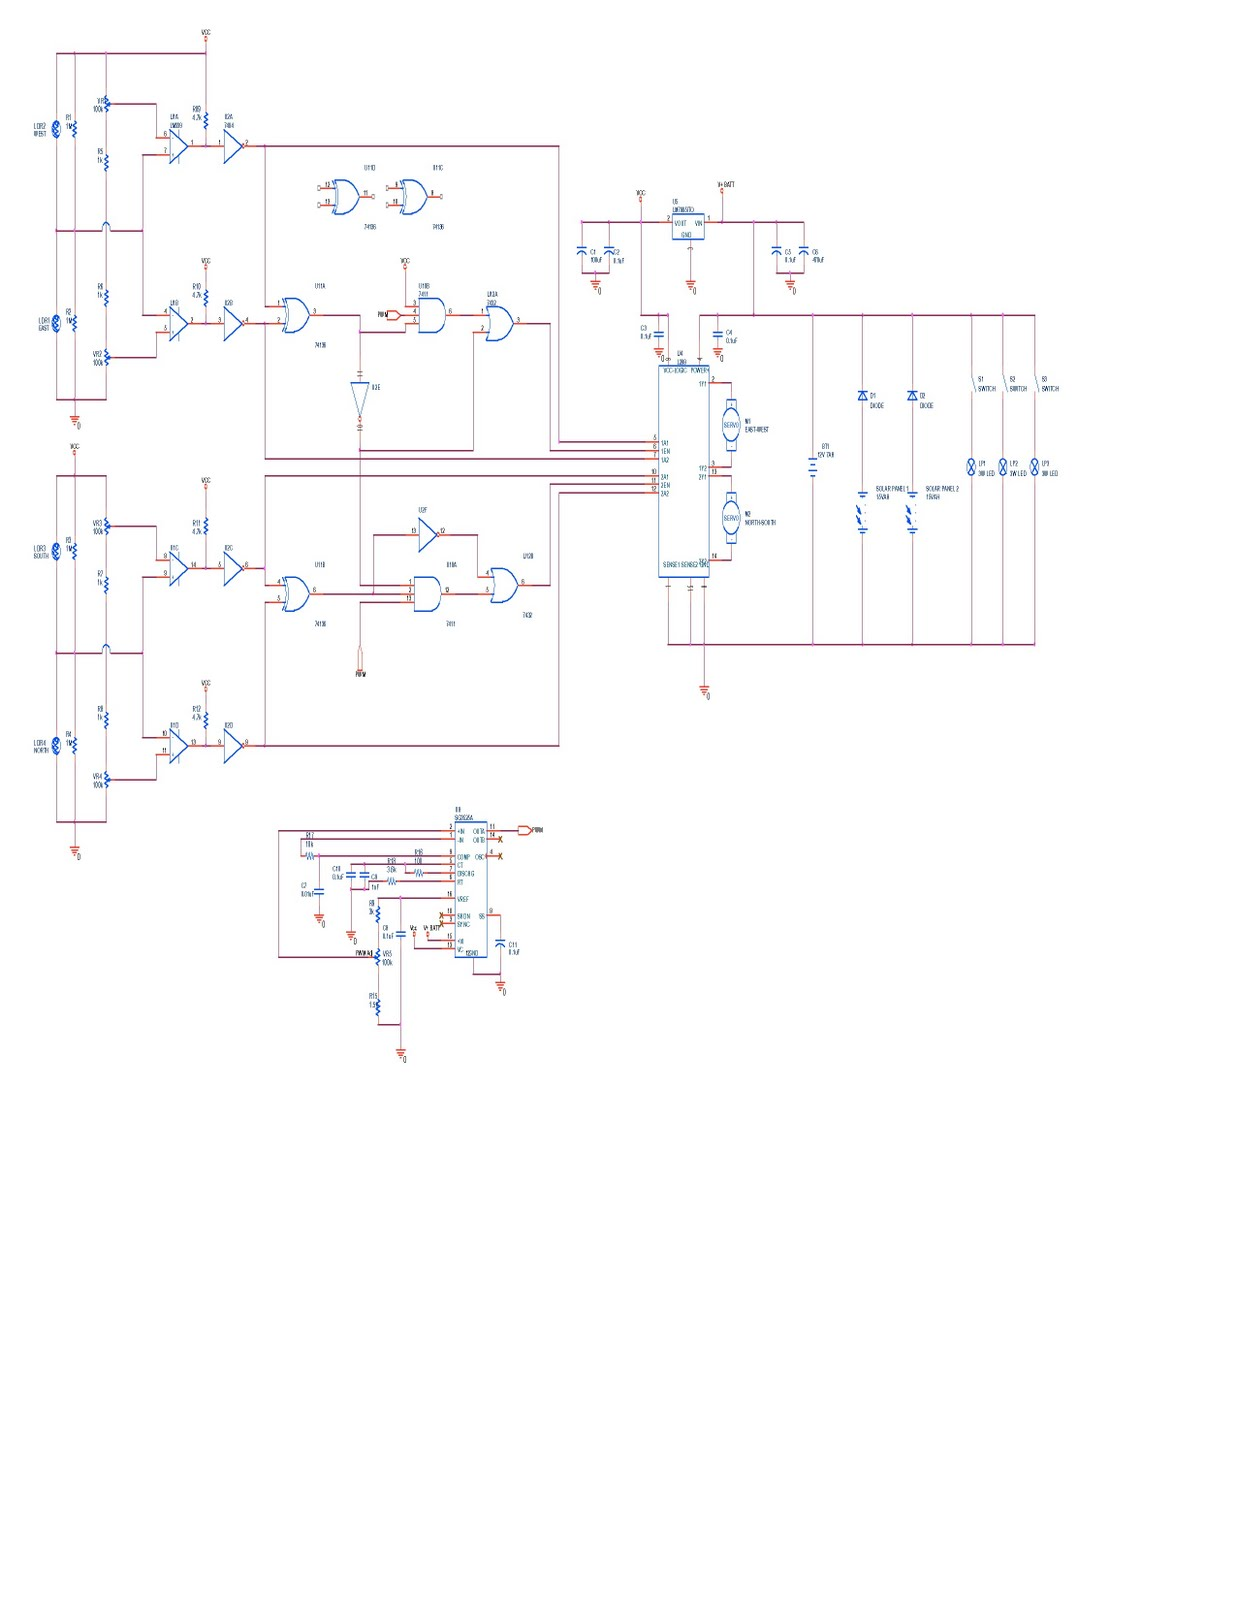 gainamplifier1 amplifiercircuit circuit diagram seekiccom data coaxial cable driver circuit diagram tradeoficcom [ 1236 x 1600 Pixel ]